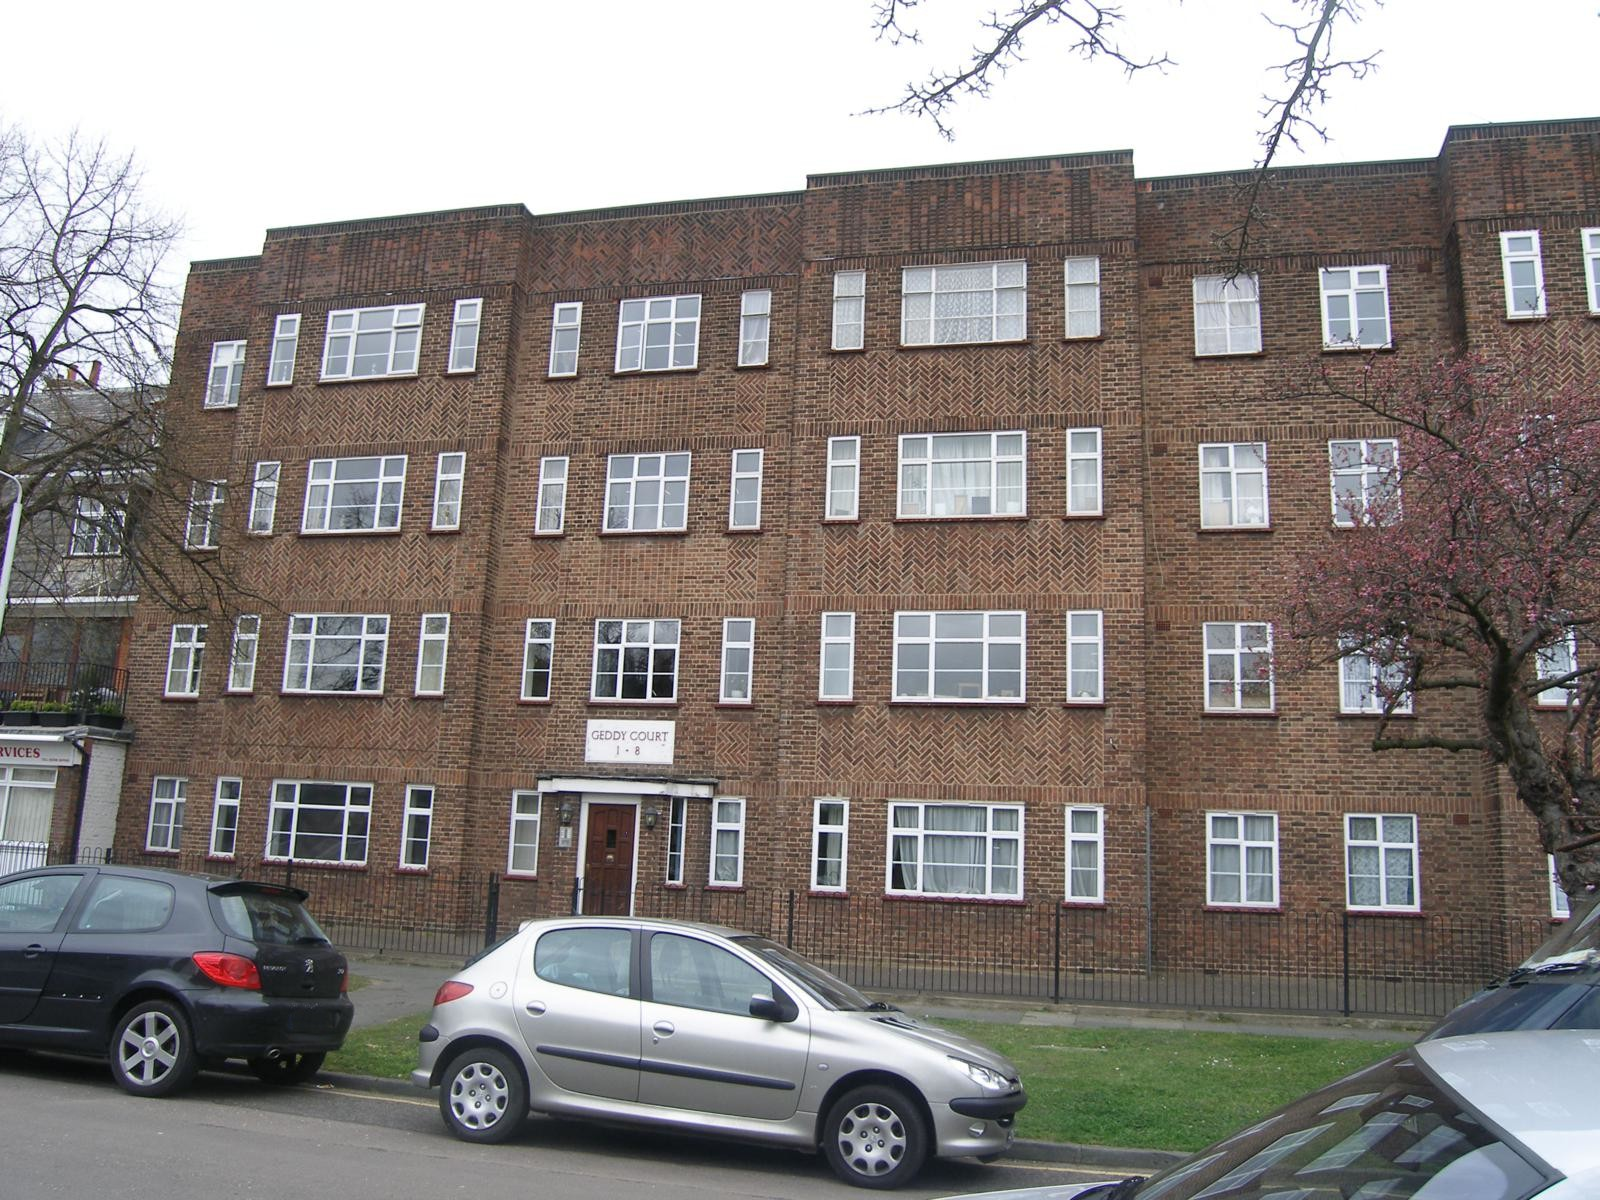 Geddy Court, Hare Hall Lane, Gidea Park, Romford, Essex, RM2